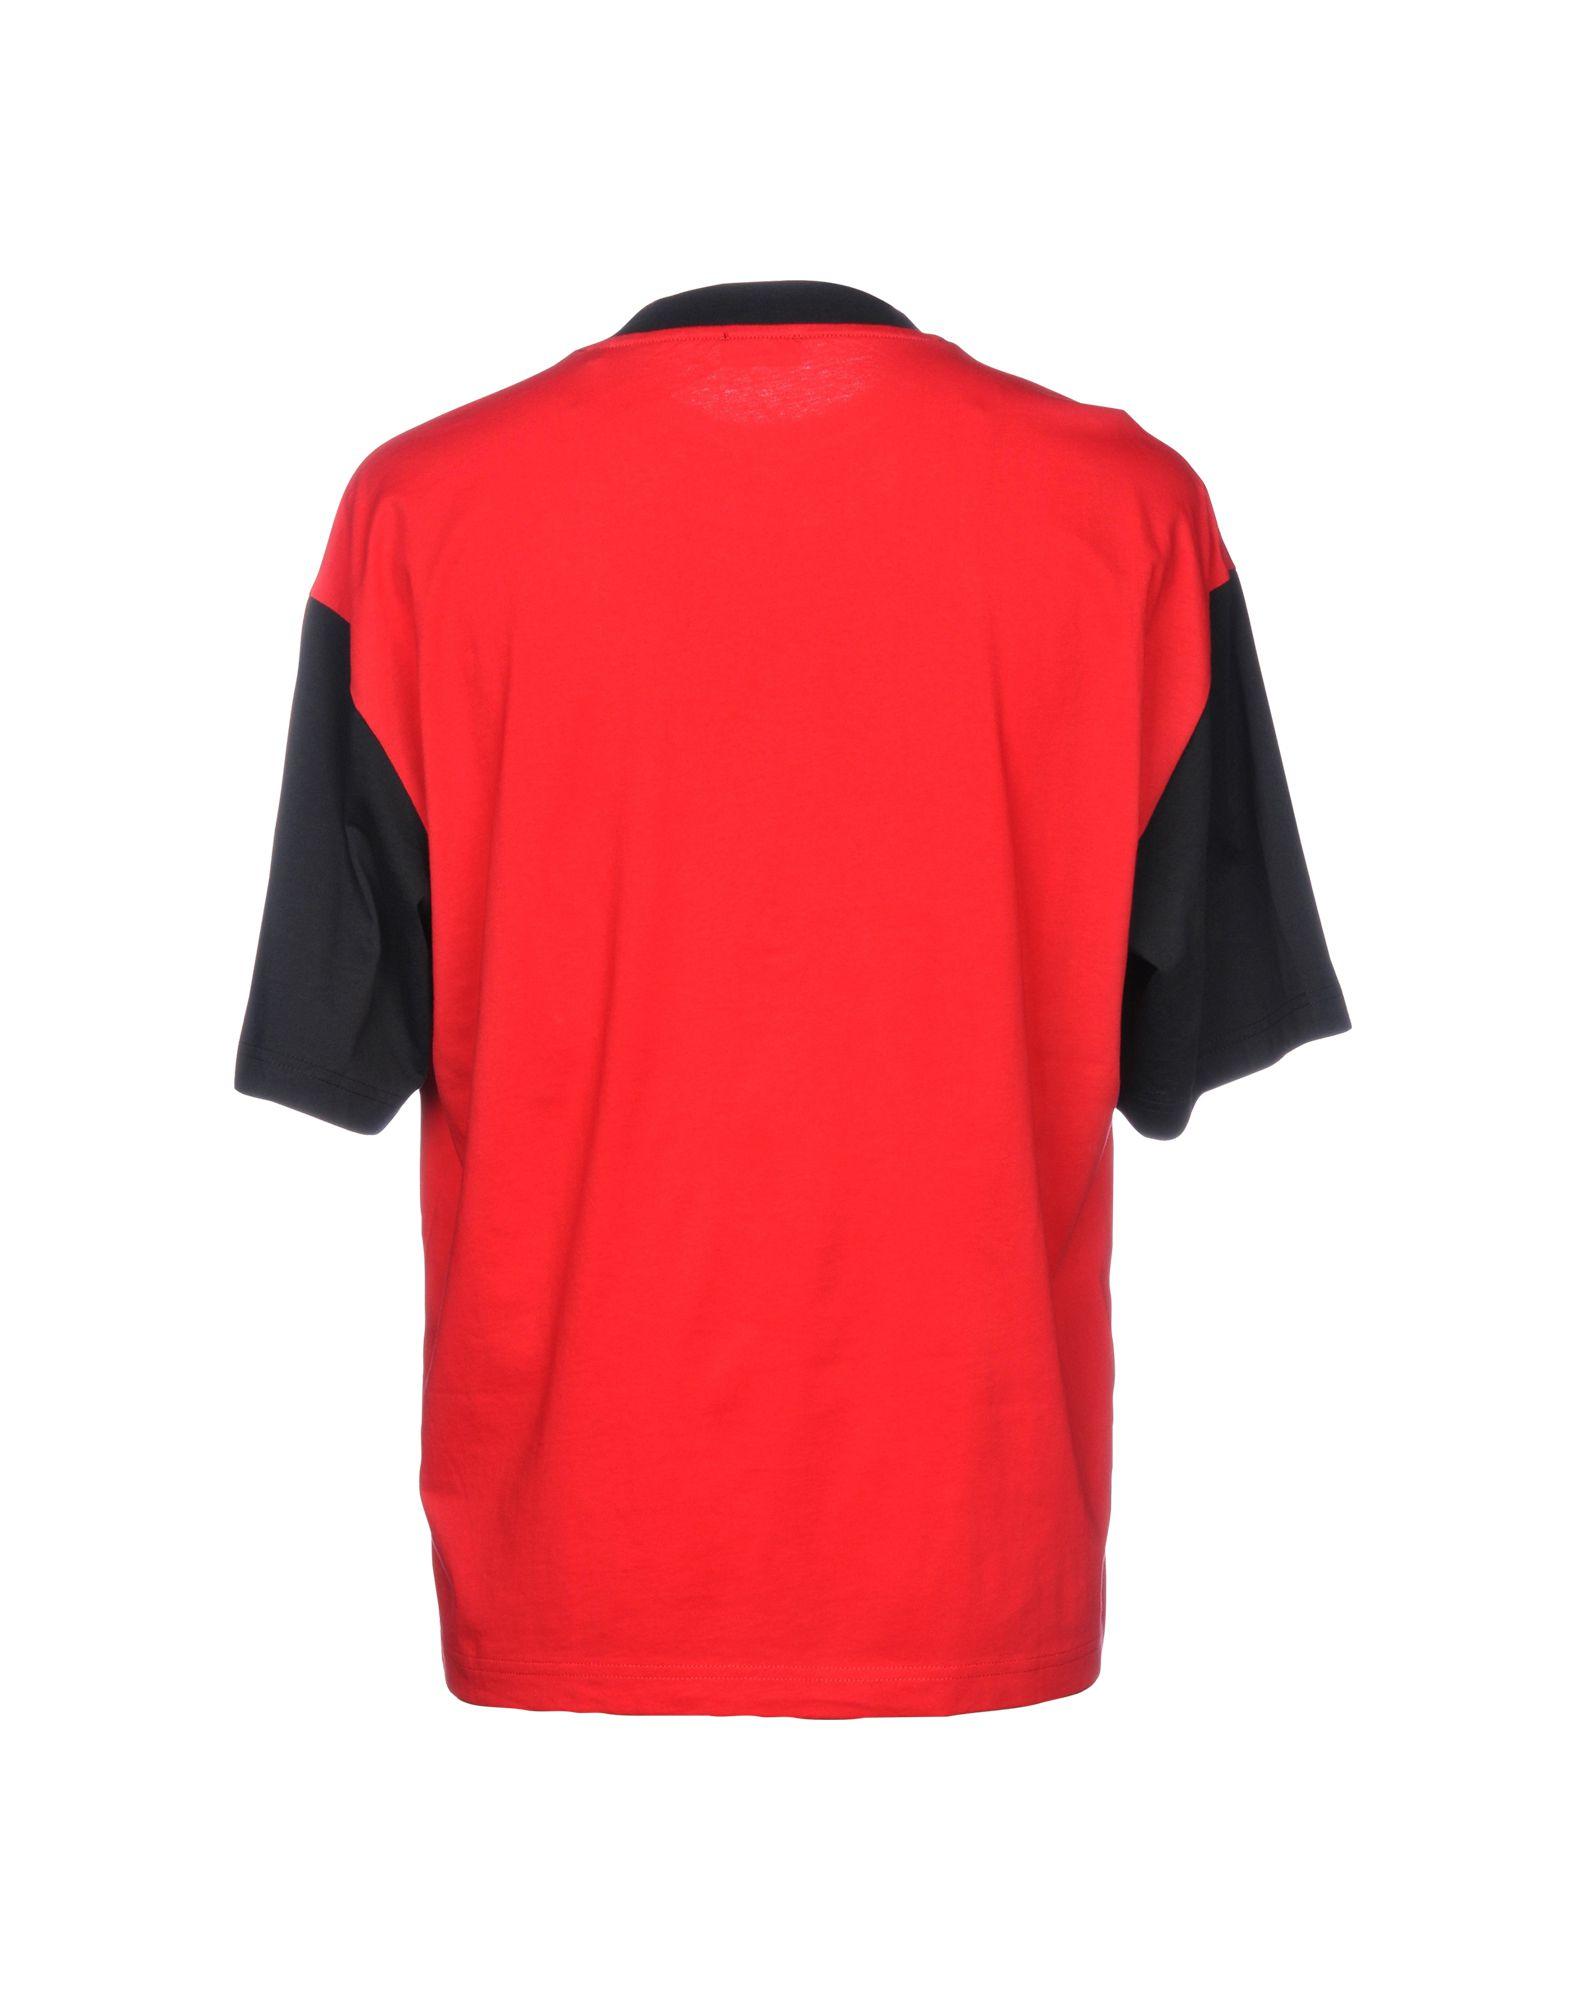 A buon mercato A buon mercato Uomo T-Shirt Diesel Uomo mercato - 12188621WV a8acb9